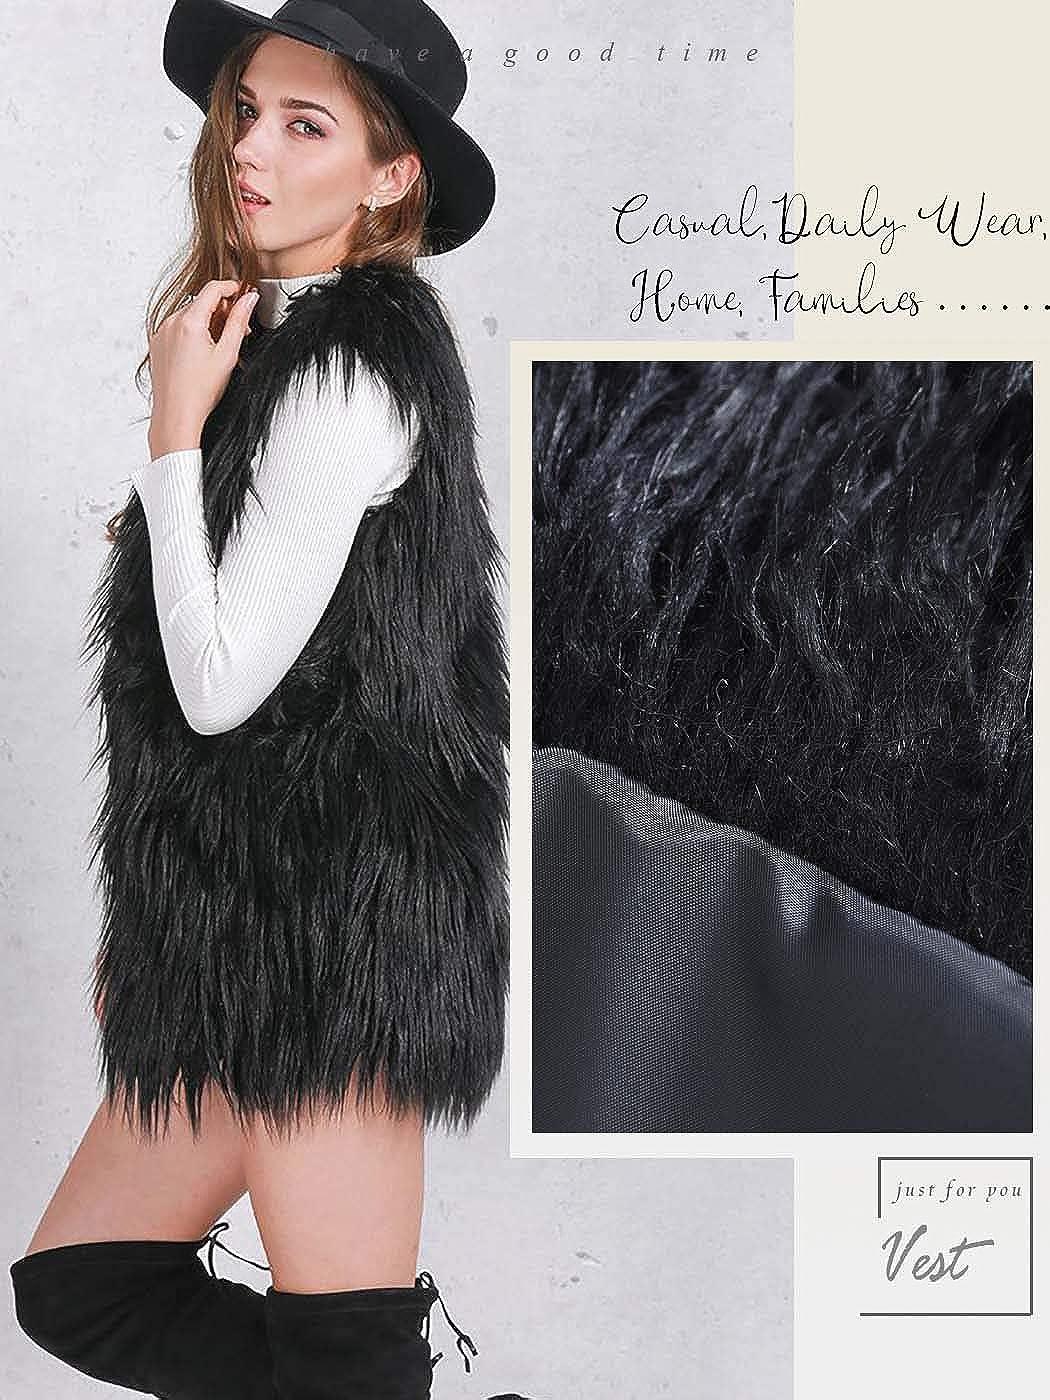 Ushiny Fur Vest Sleeveless Lightweight Autumn Faux Fur Vests Winter Warmer Jacket Coat for Women and Girls